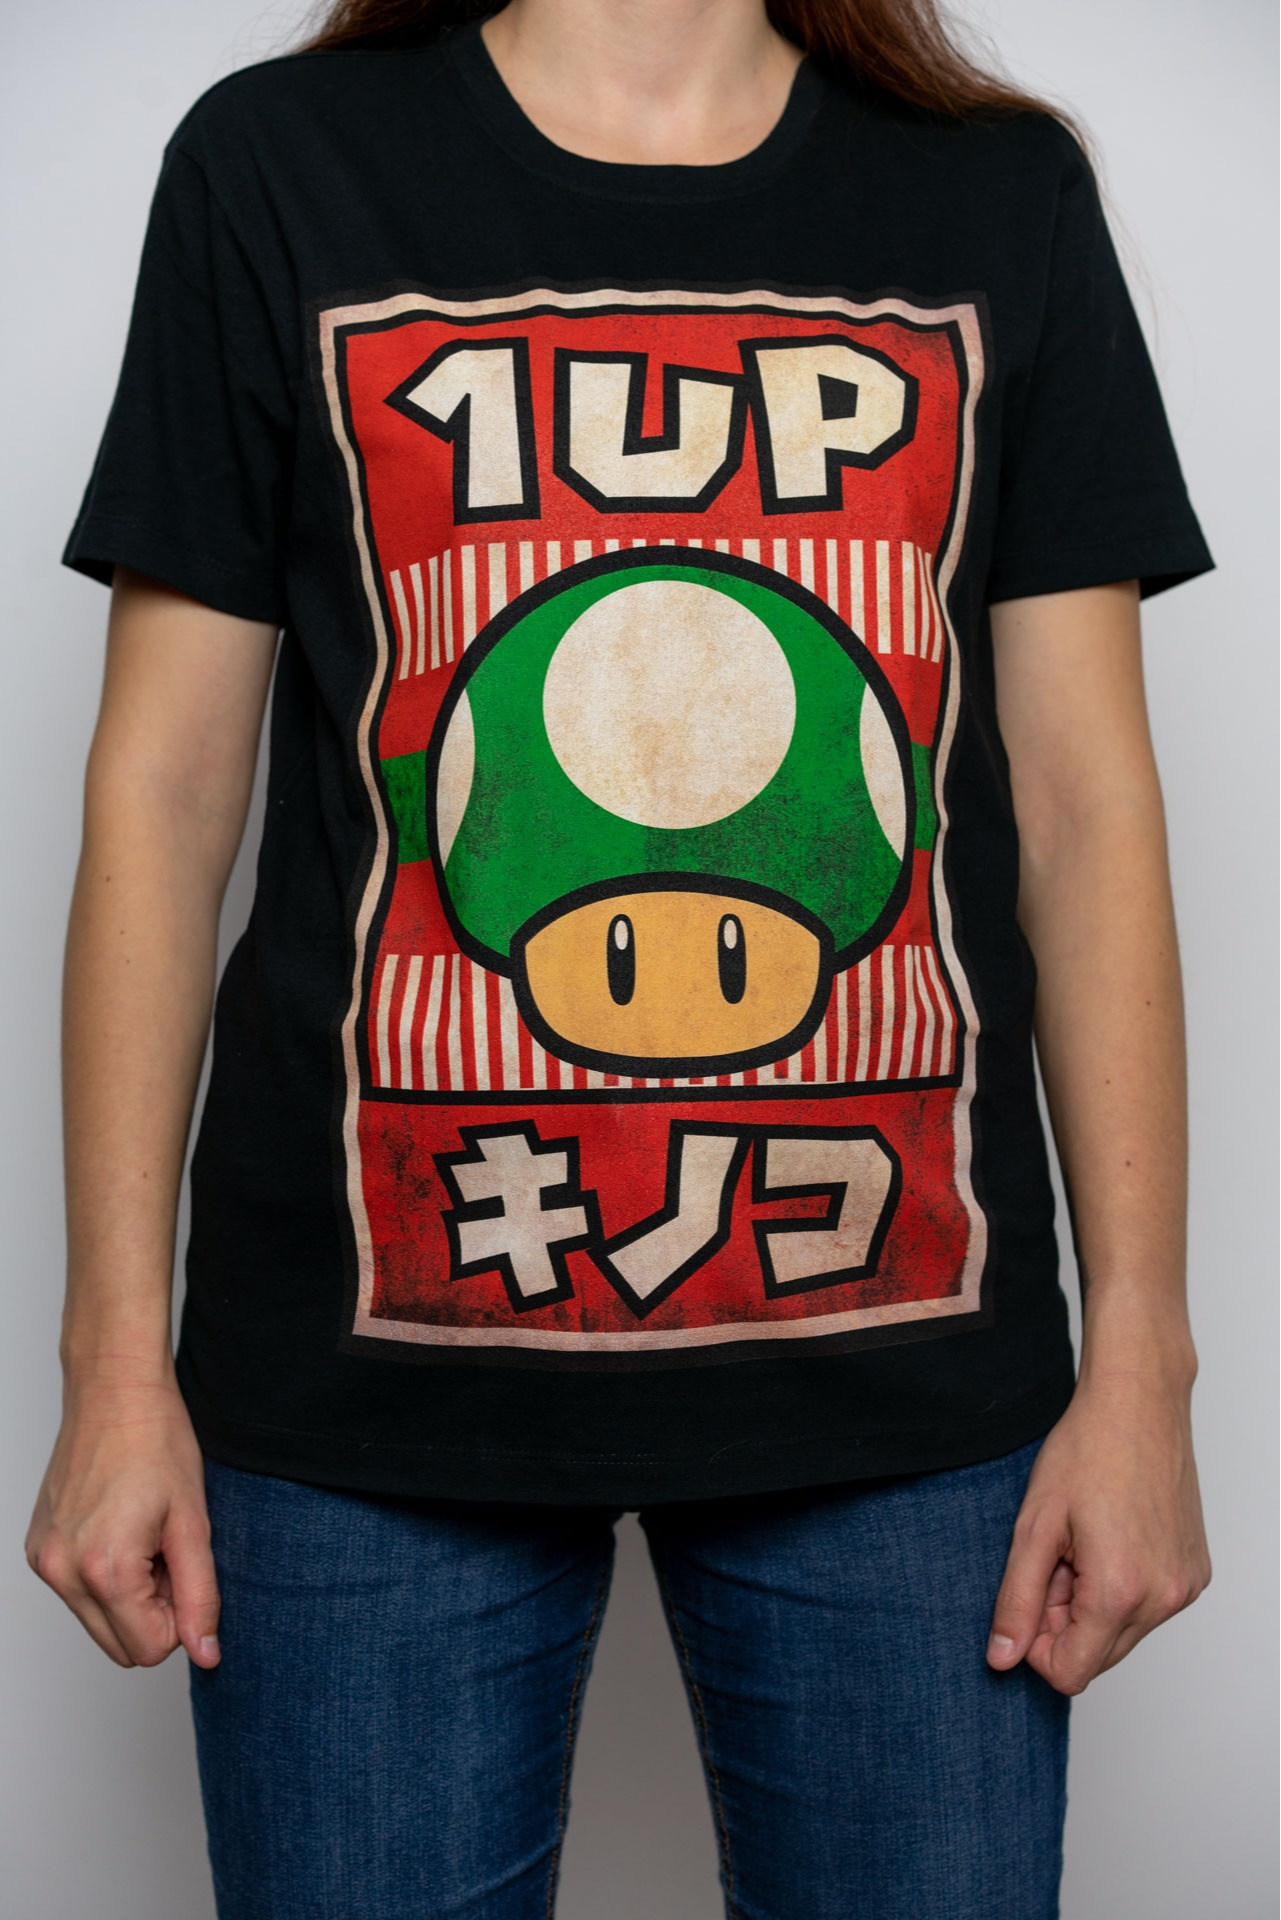 Tričko Nintendo - Propaganda Poster 1-UP Mushroom (velikost M) (PC)